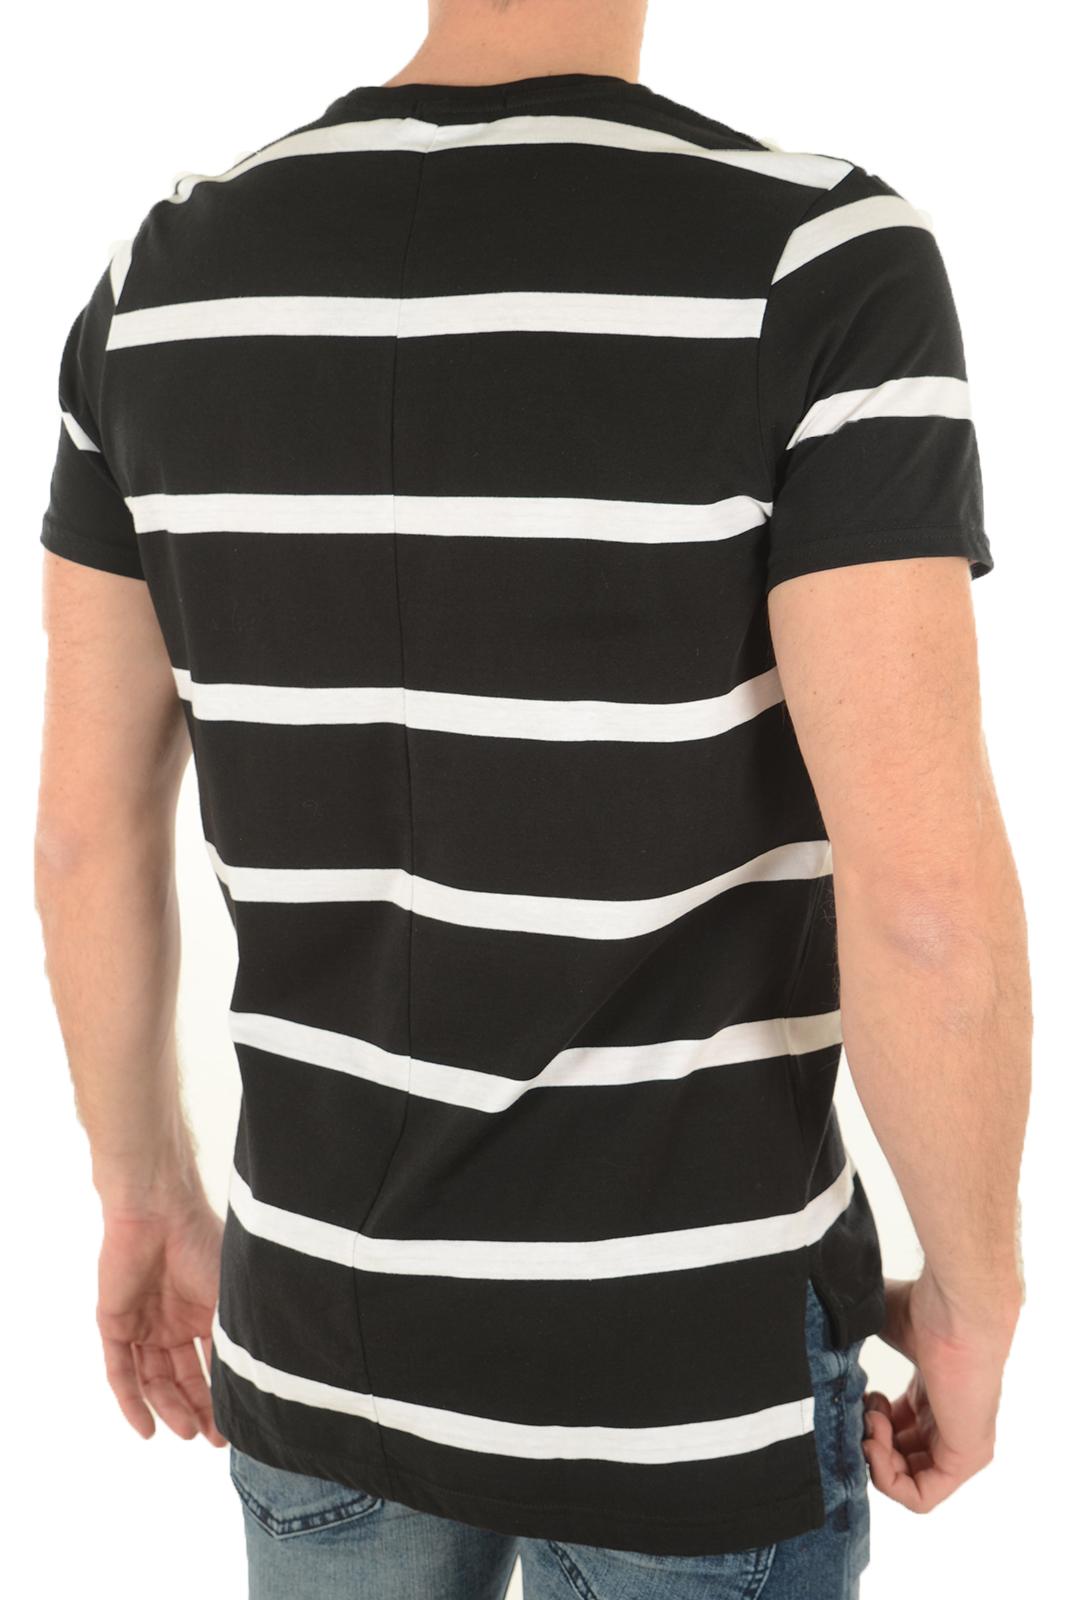 Tee-shirts  Redskins PLUTON CERES BLACK